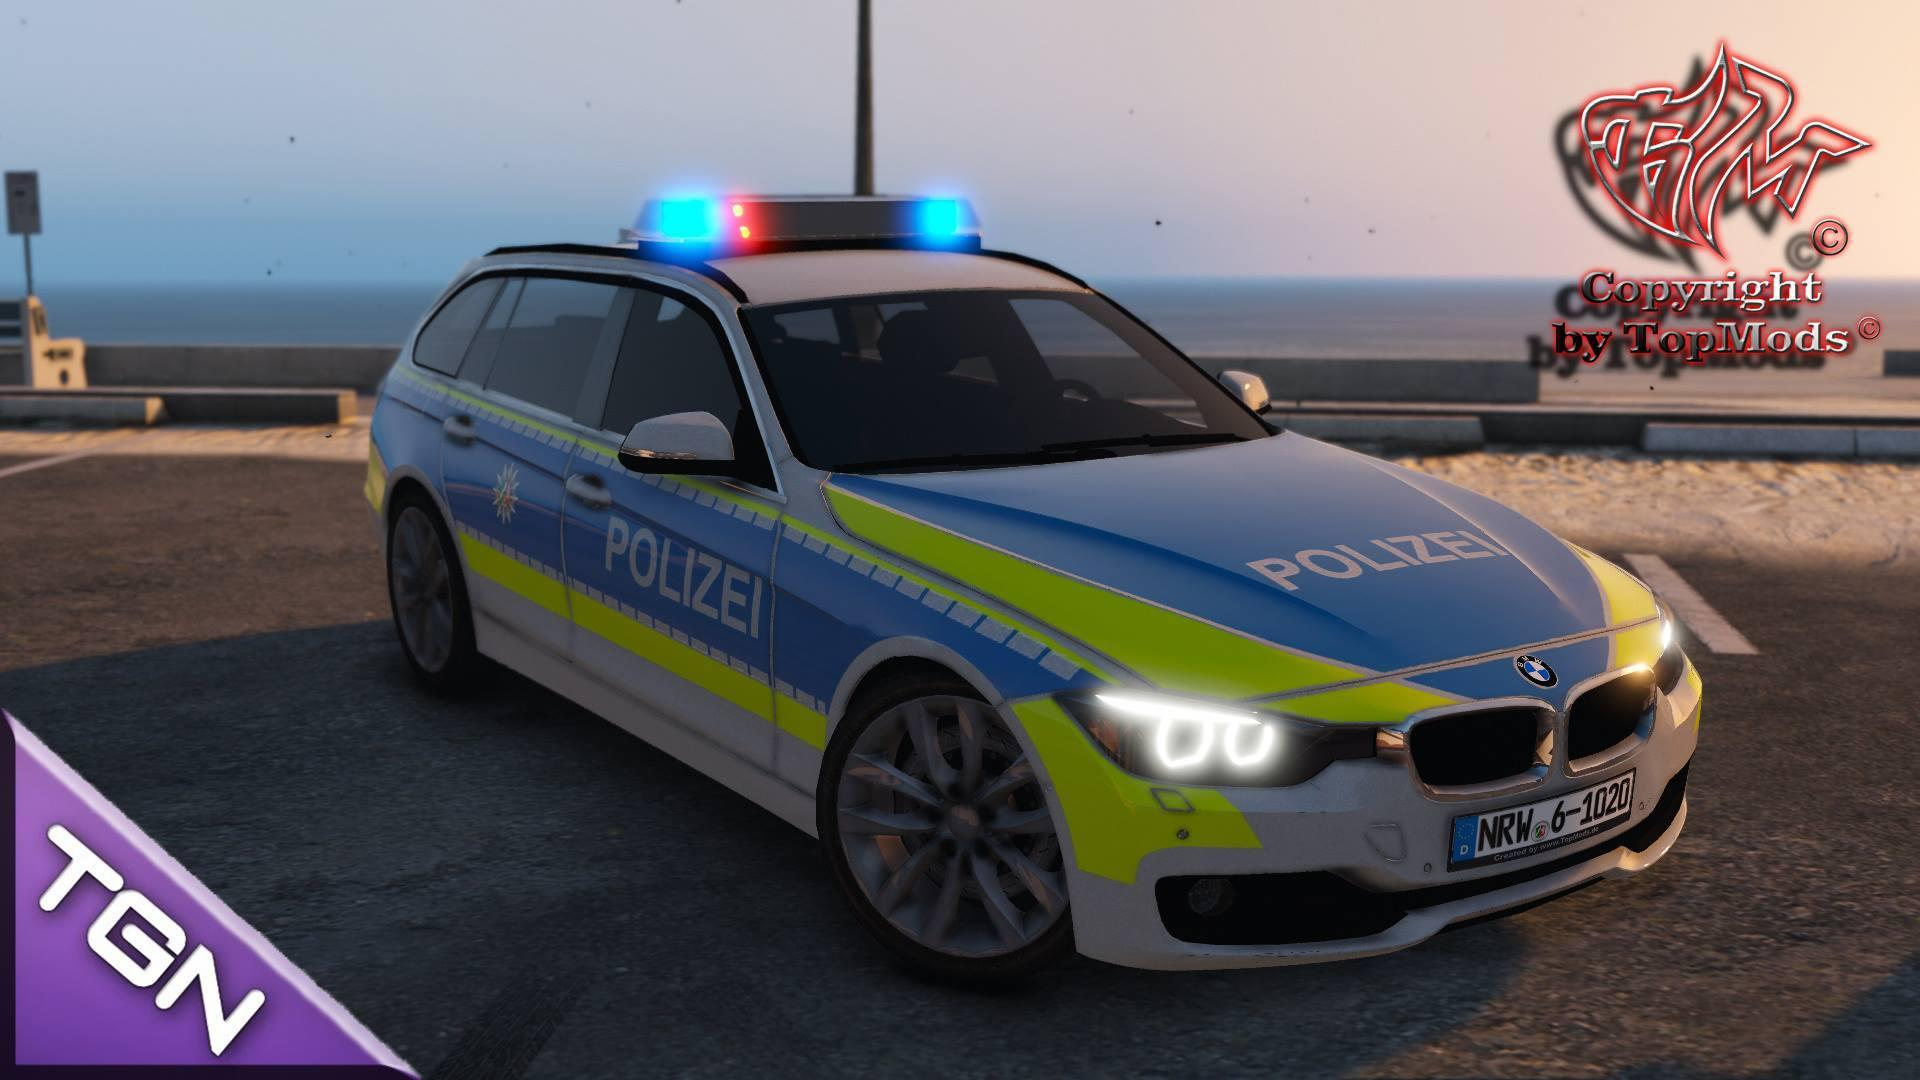 Bmw F31 Polizei Nrw Gta5 Mods Com